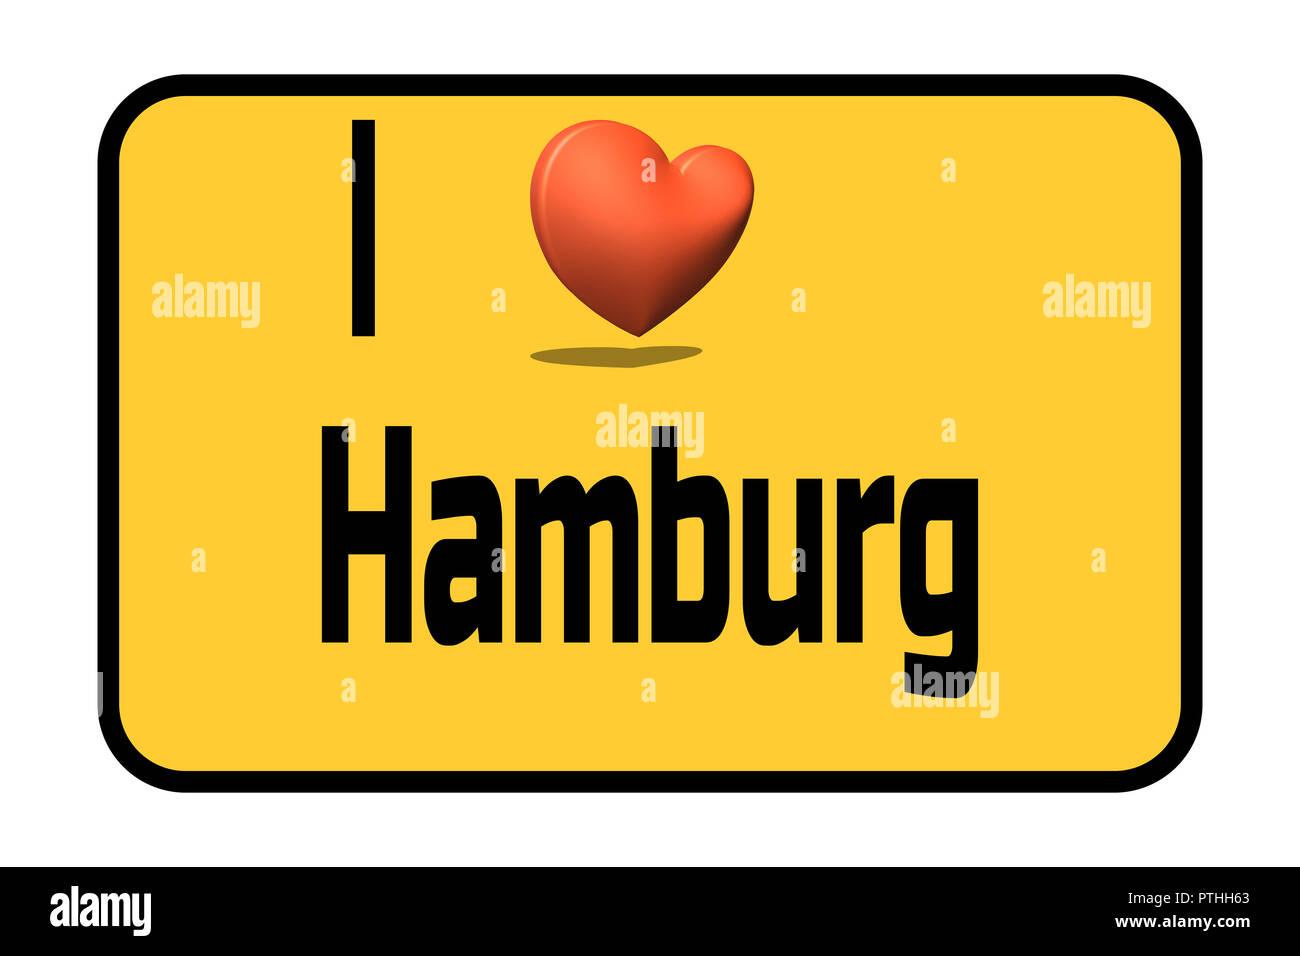 City entrance road sign with caption in english - I love my city Hamburg and heart symbol - Stock Image